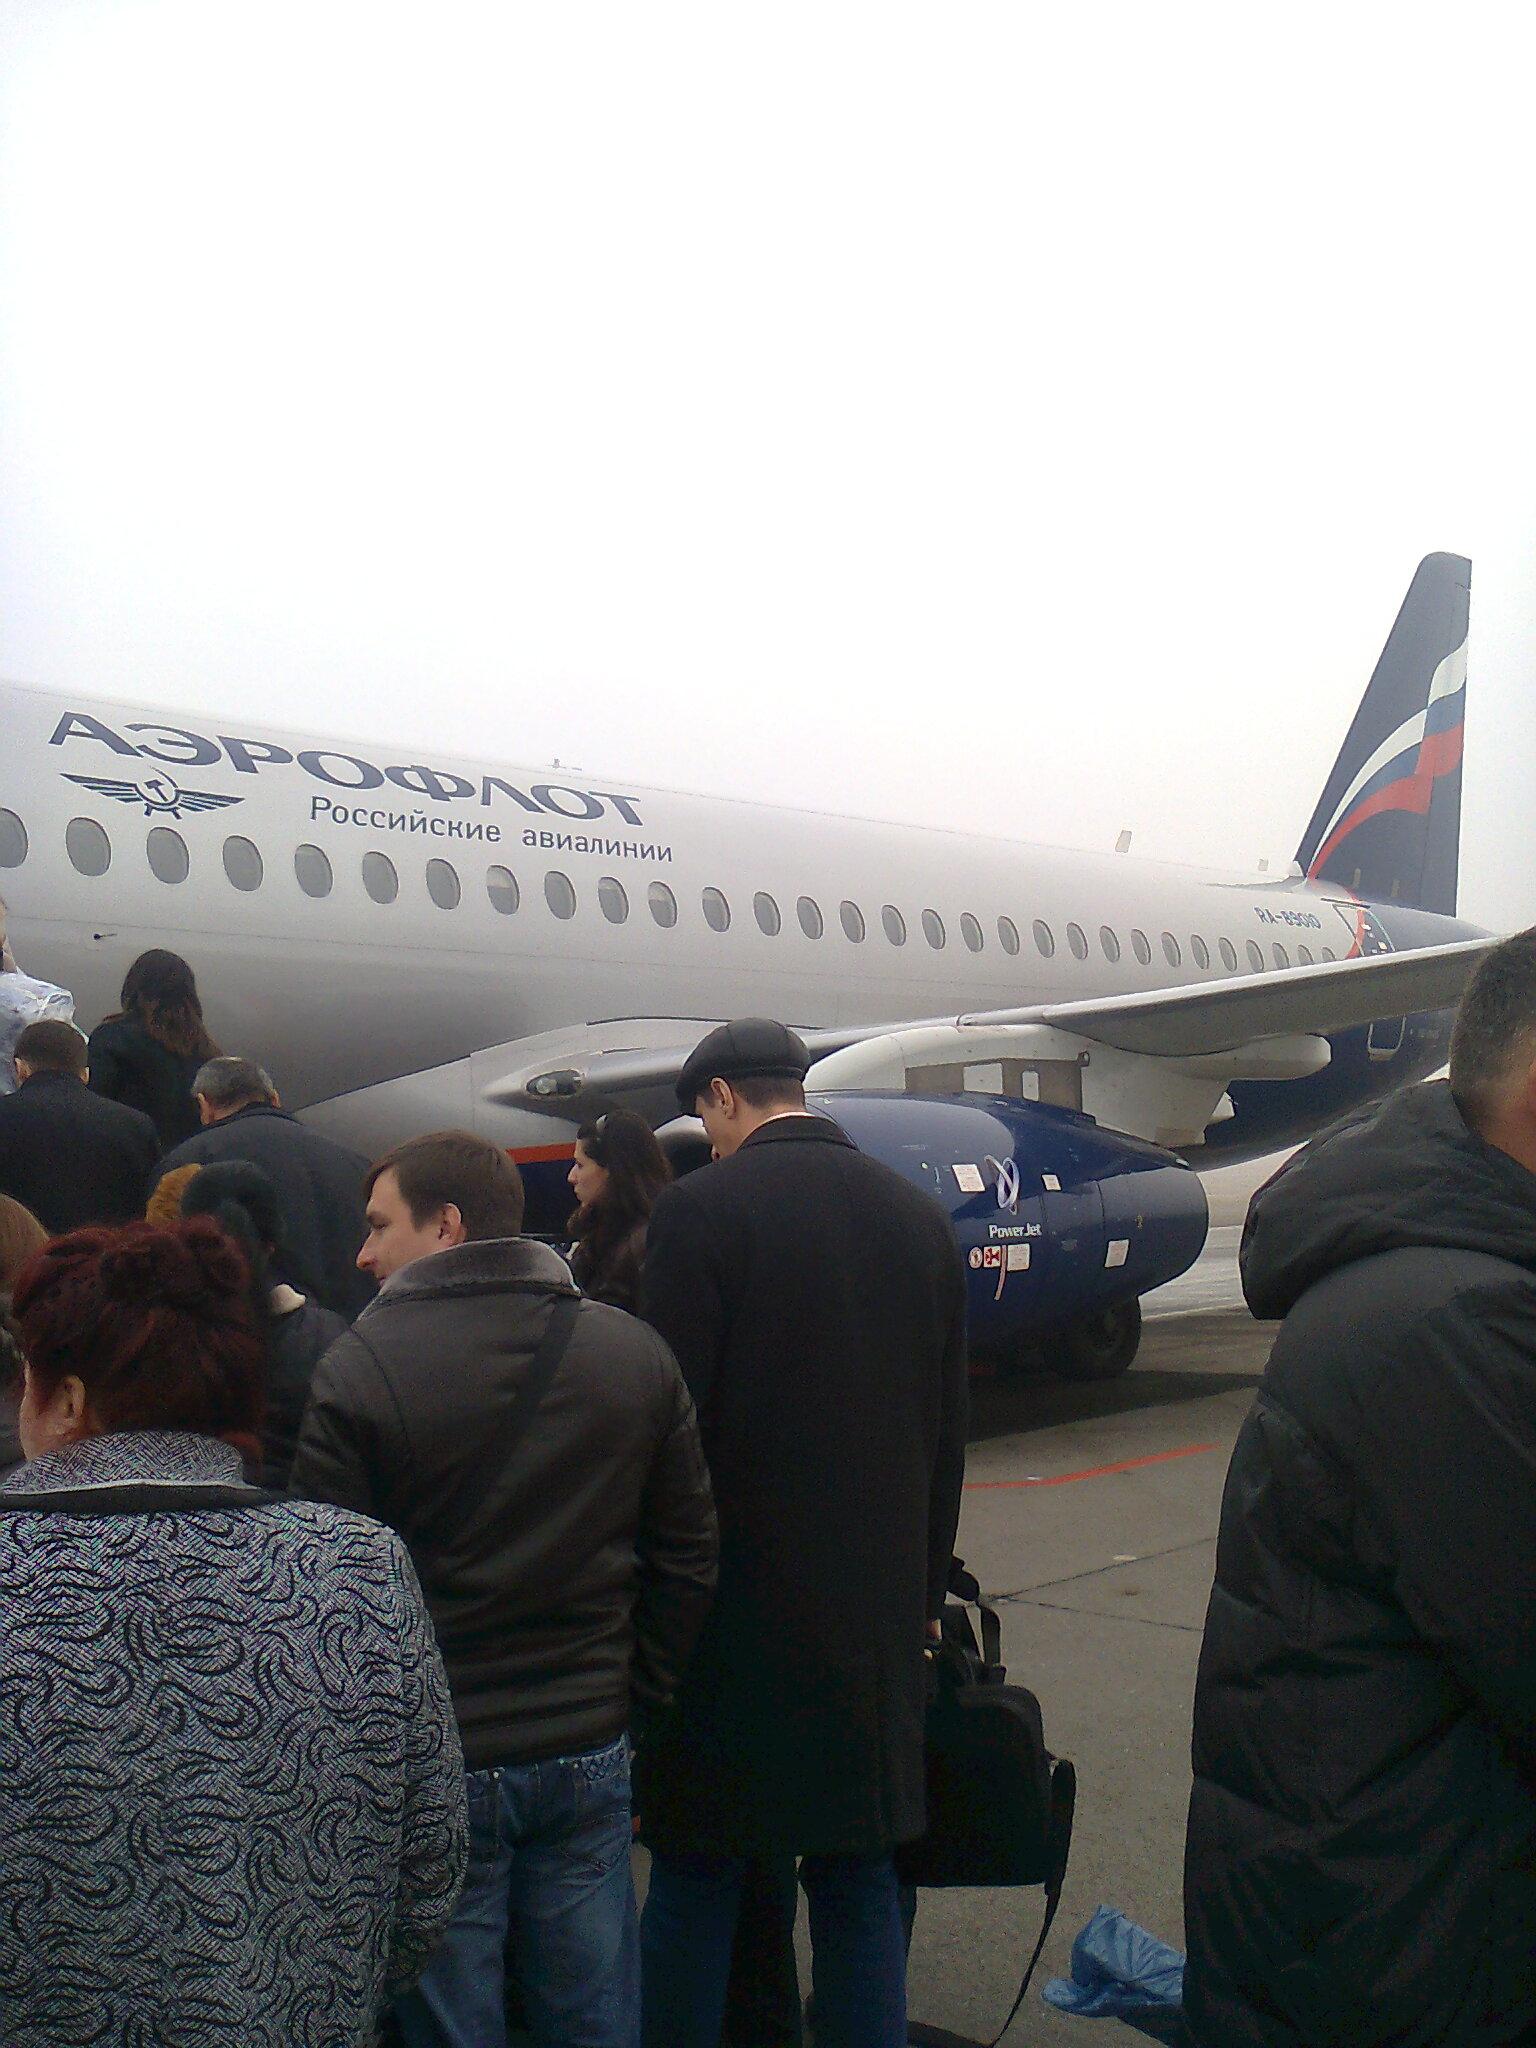 Посадка на рейс Аэрофлота Москва-Астрахань